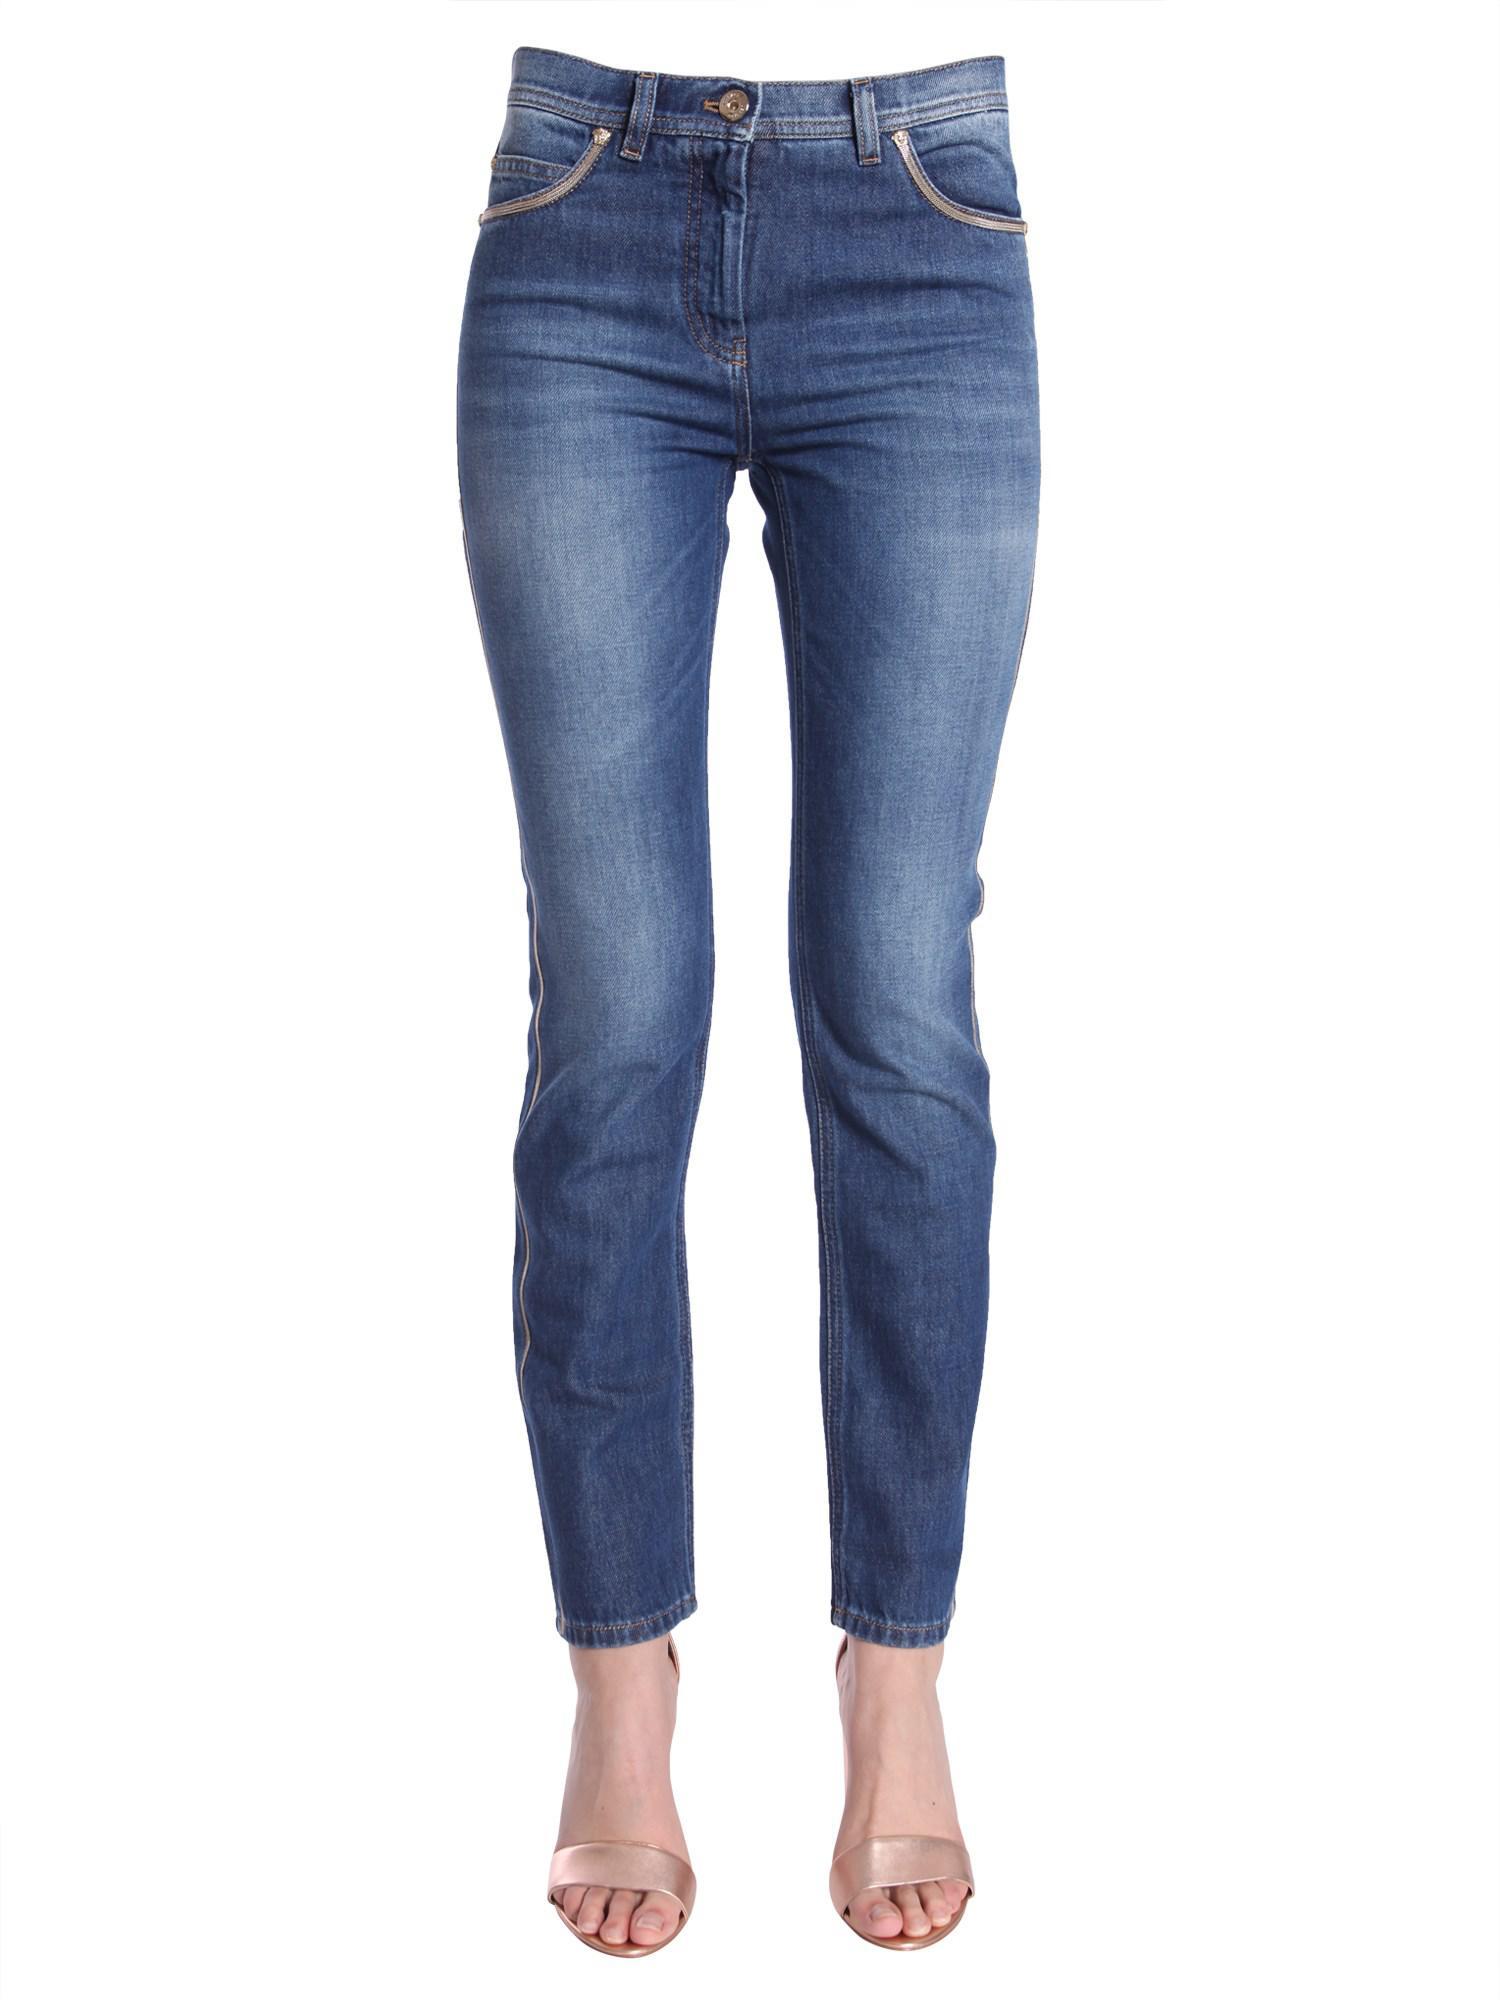 vita skinny jeans